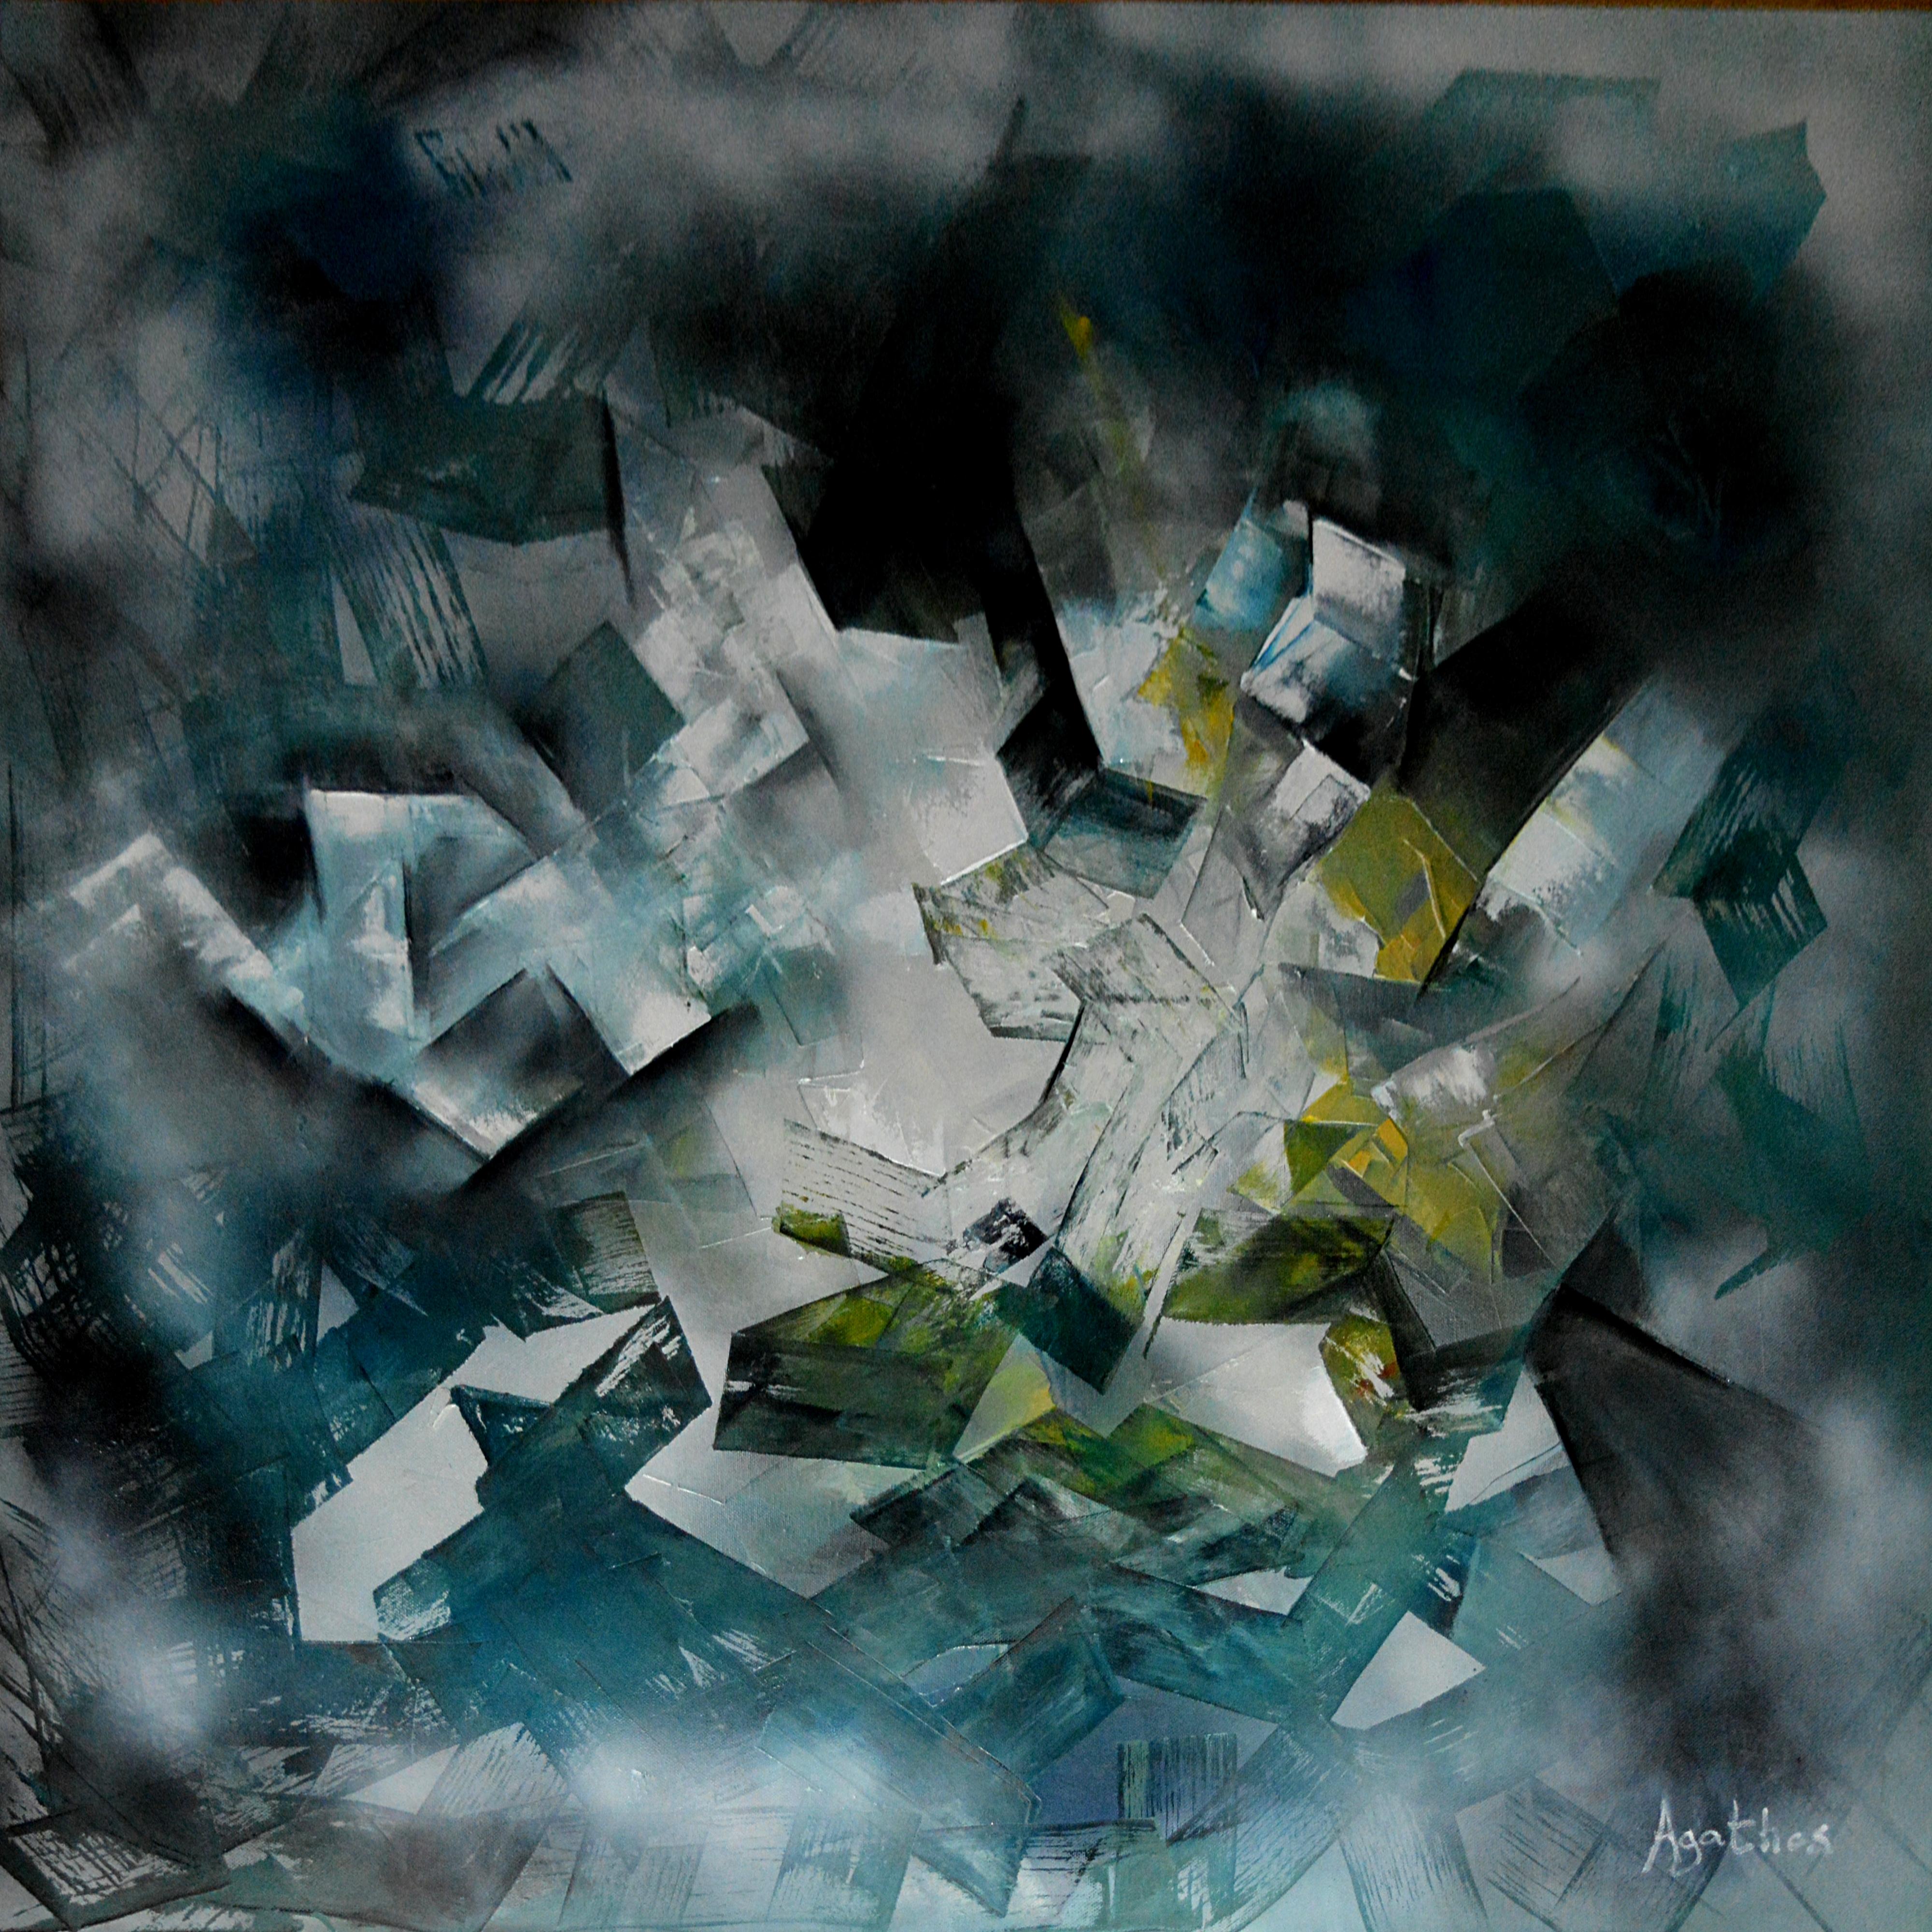 Intorno transgeometrico - olio su tela 100x 100 cm - 2017